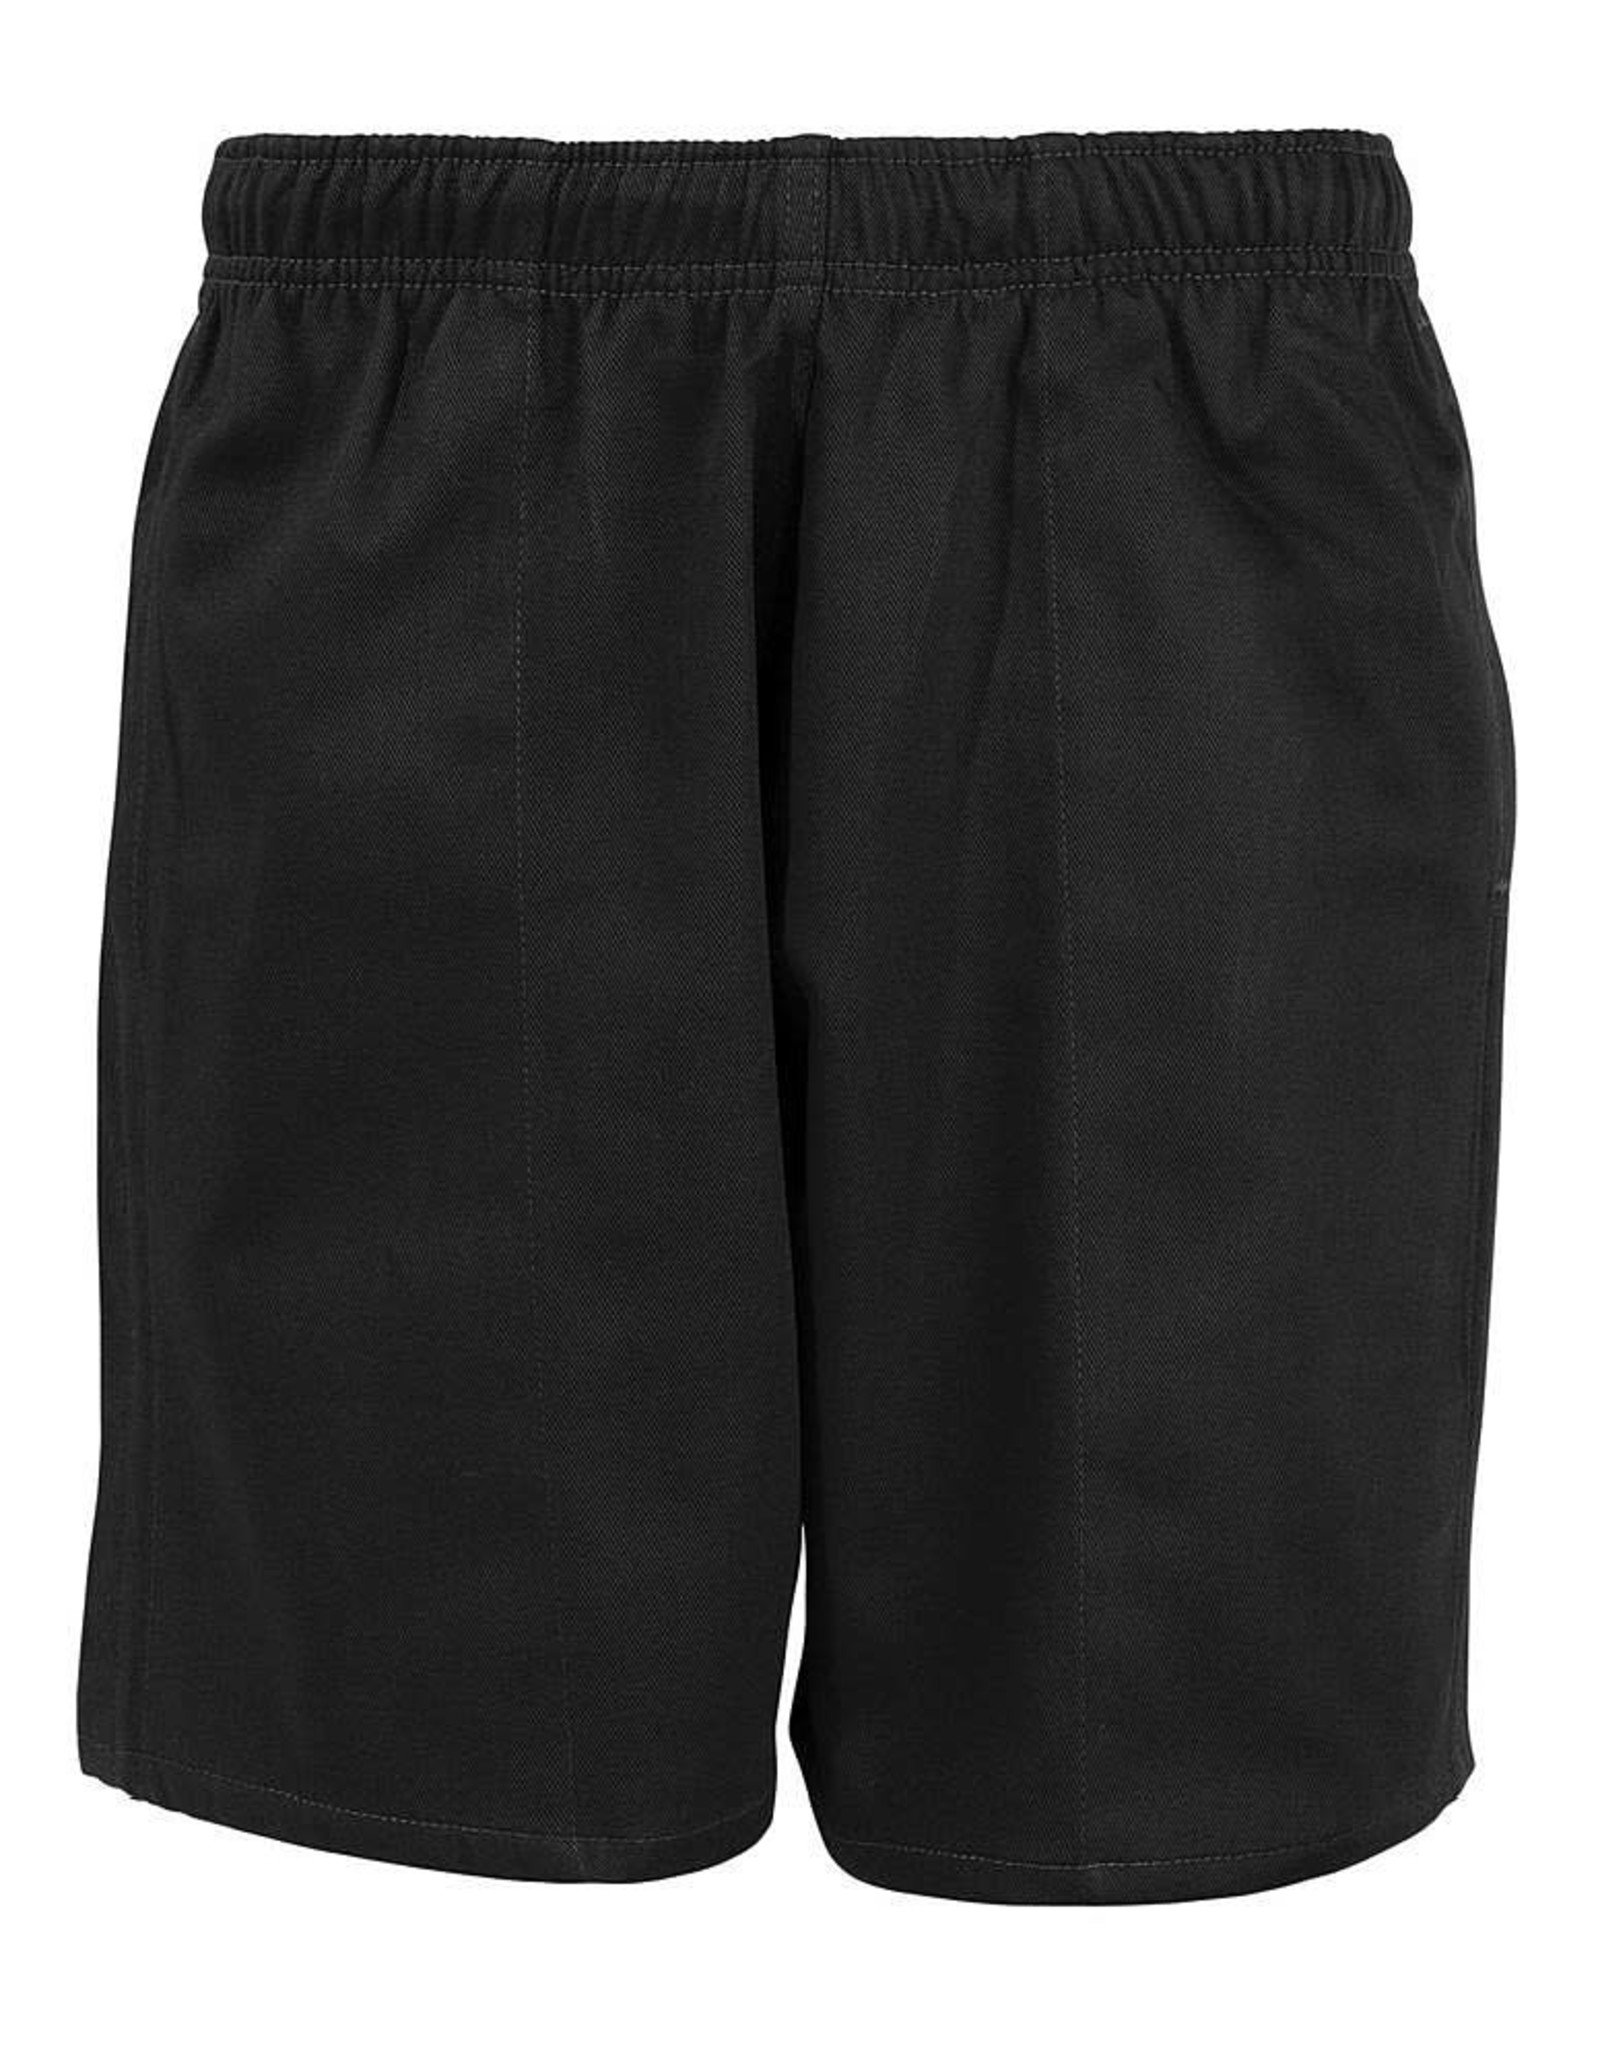 P.E. Shorts Child Size - Exhall Cedars